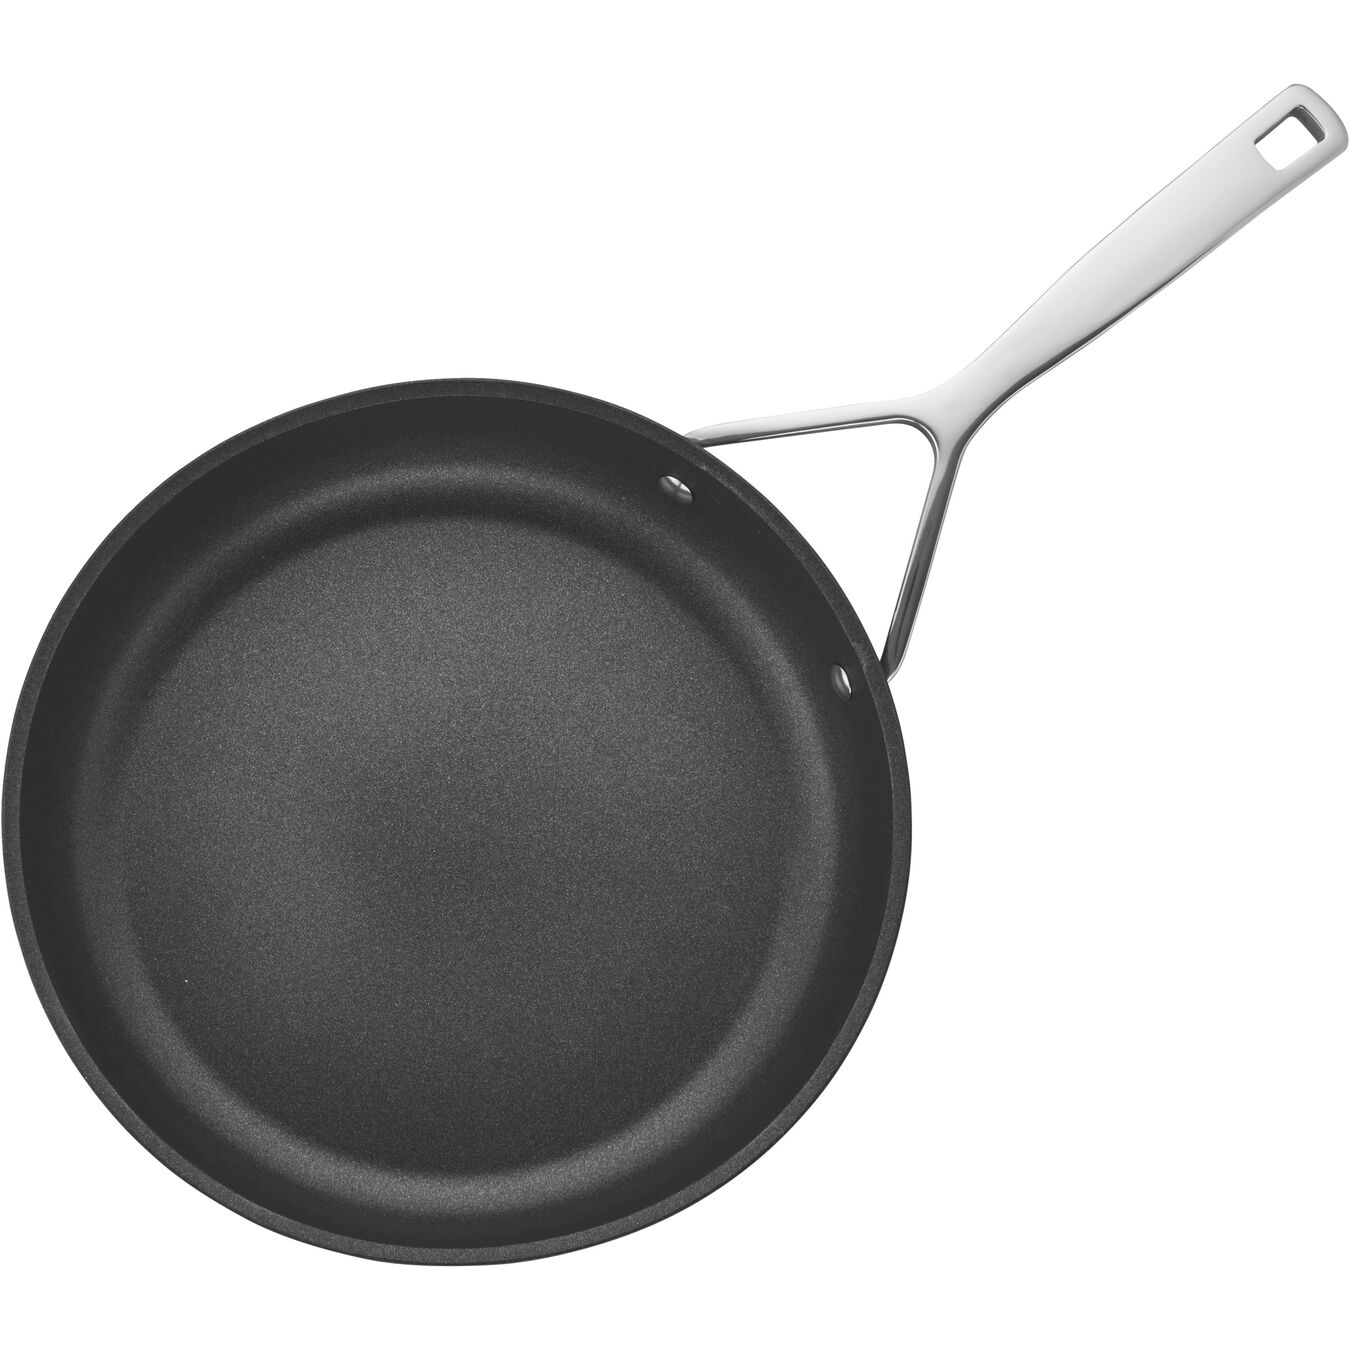 10-inch Aluminum Nonstick Fry Pan,,large 3